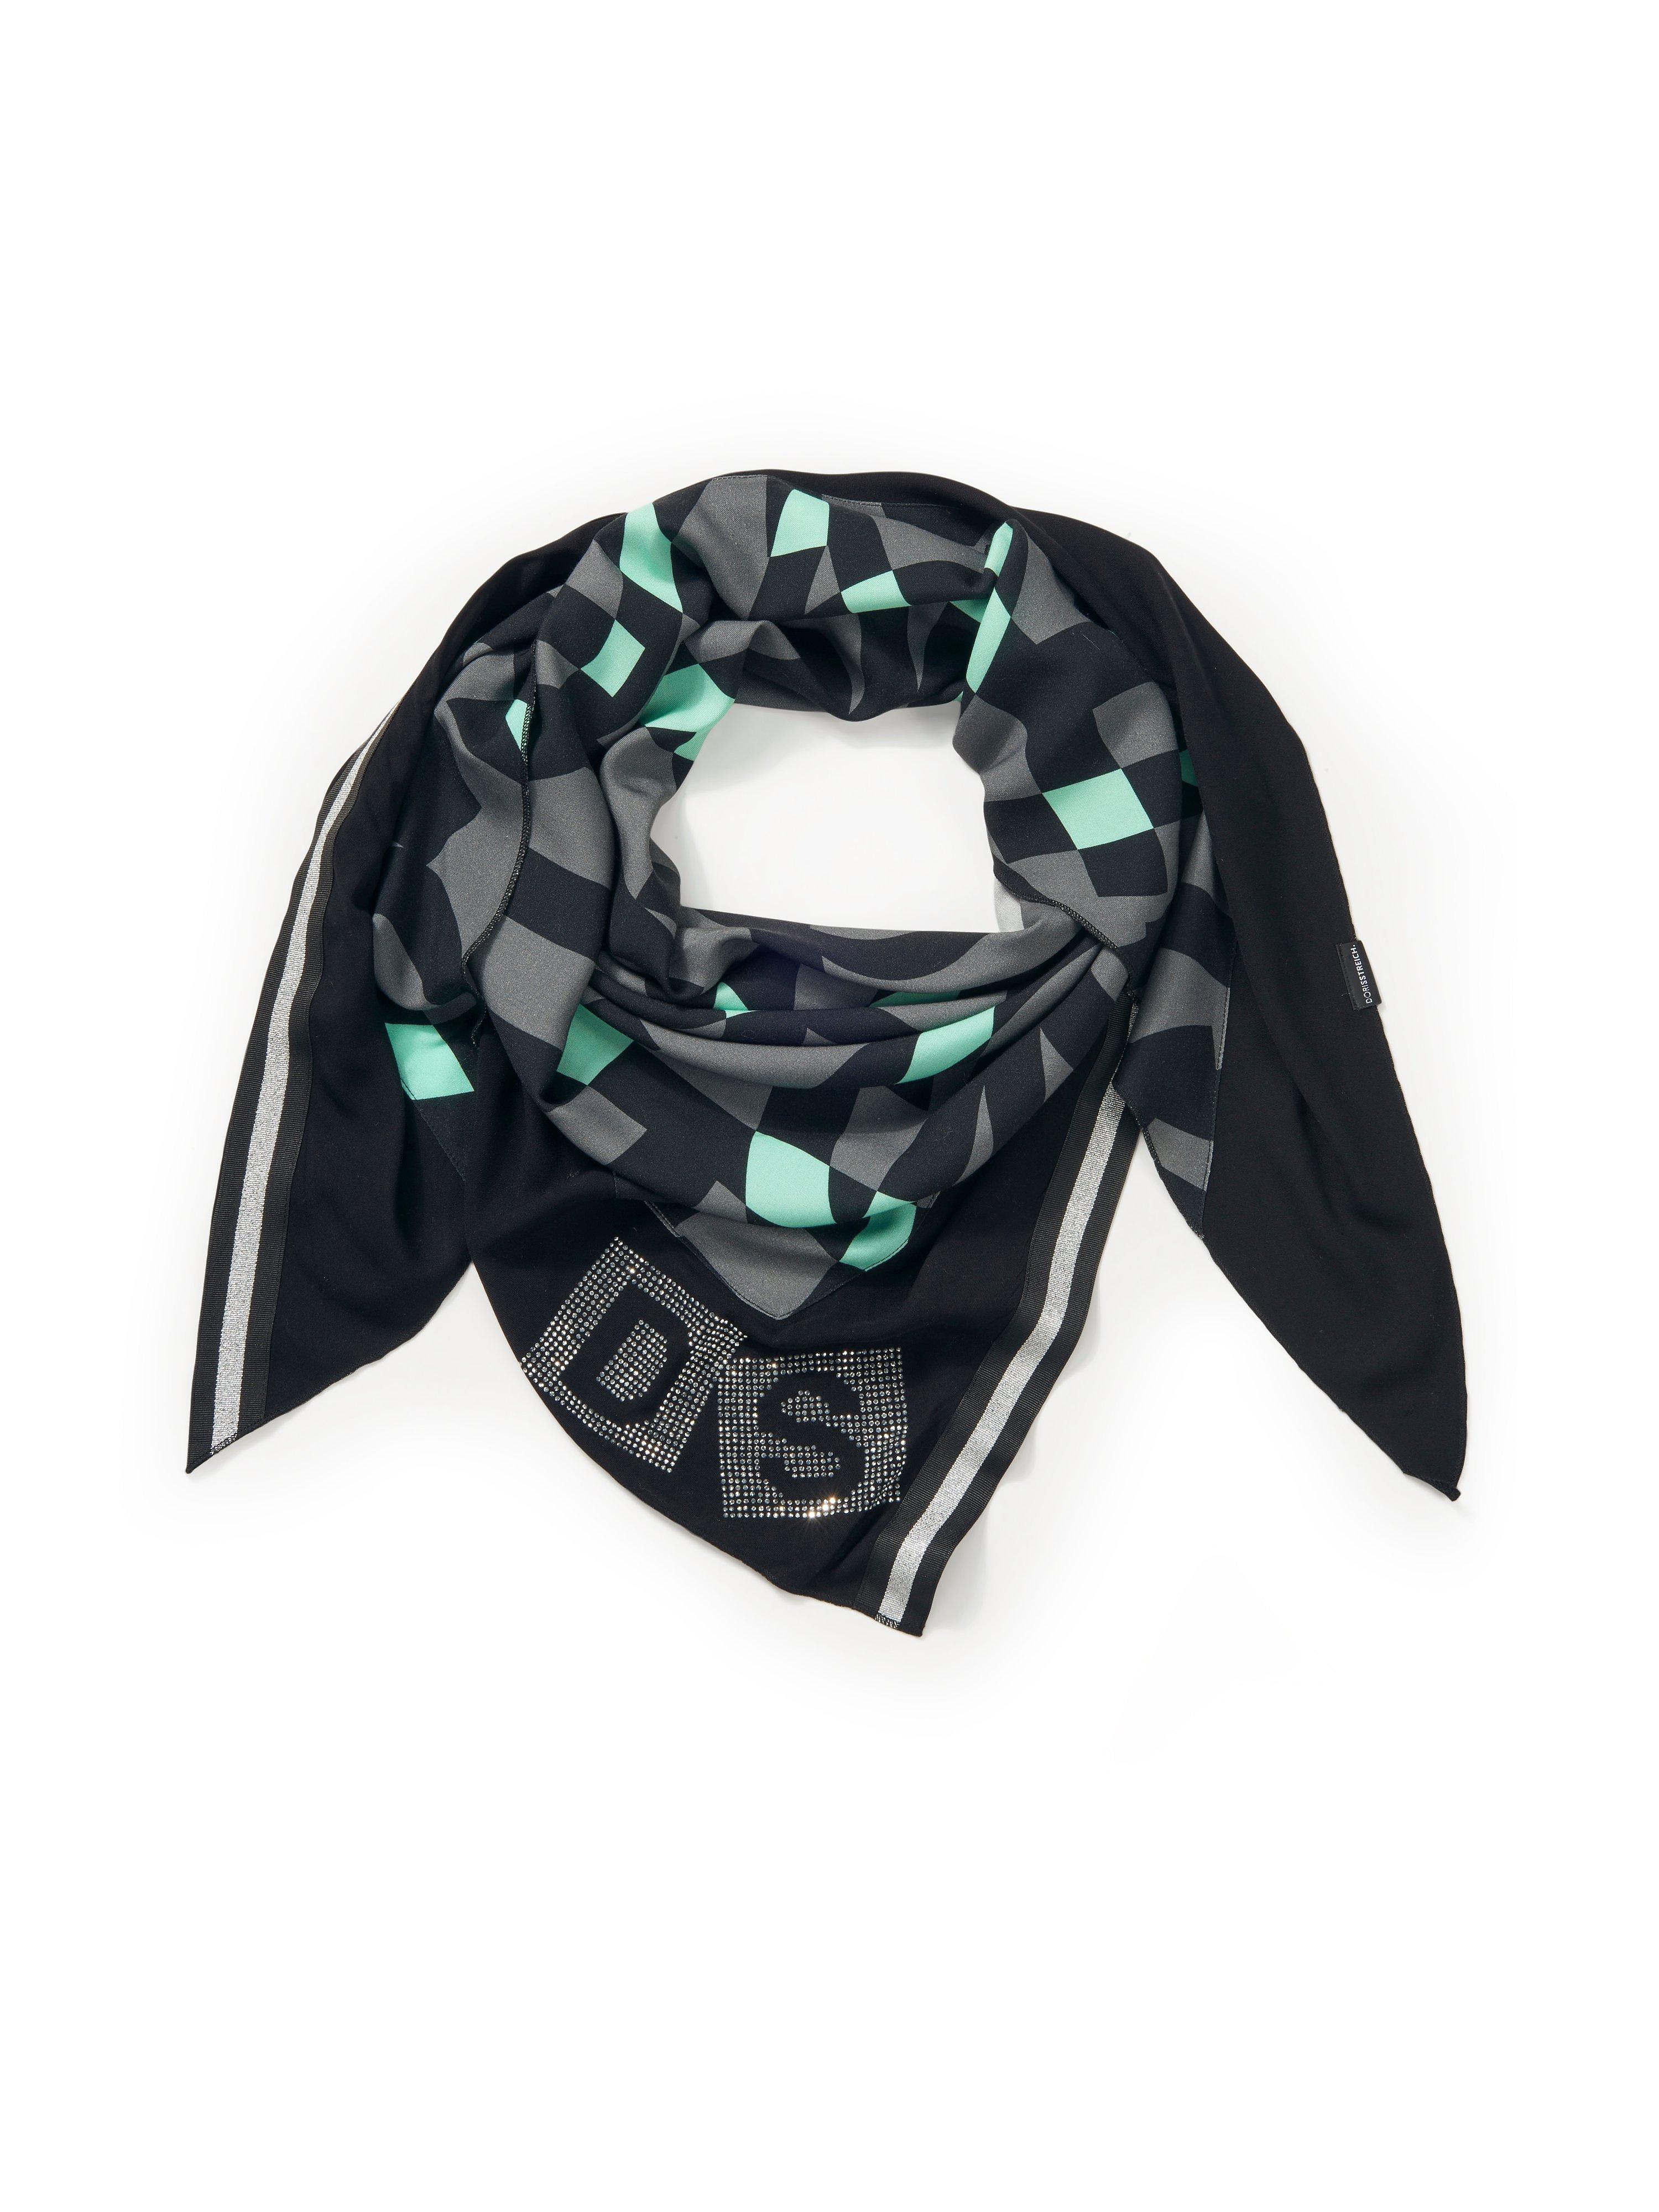 Le foulard triangle batiste  Doris Streich gris